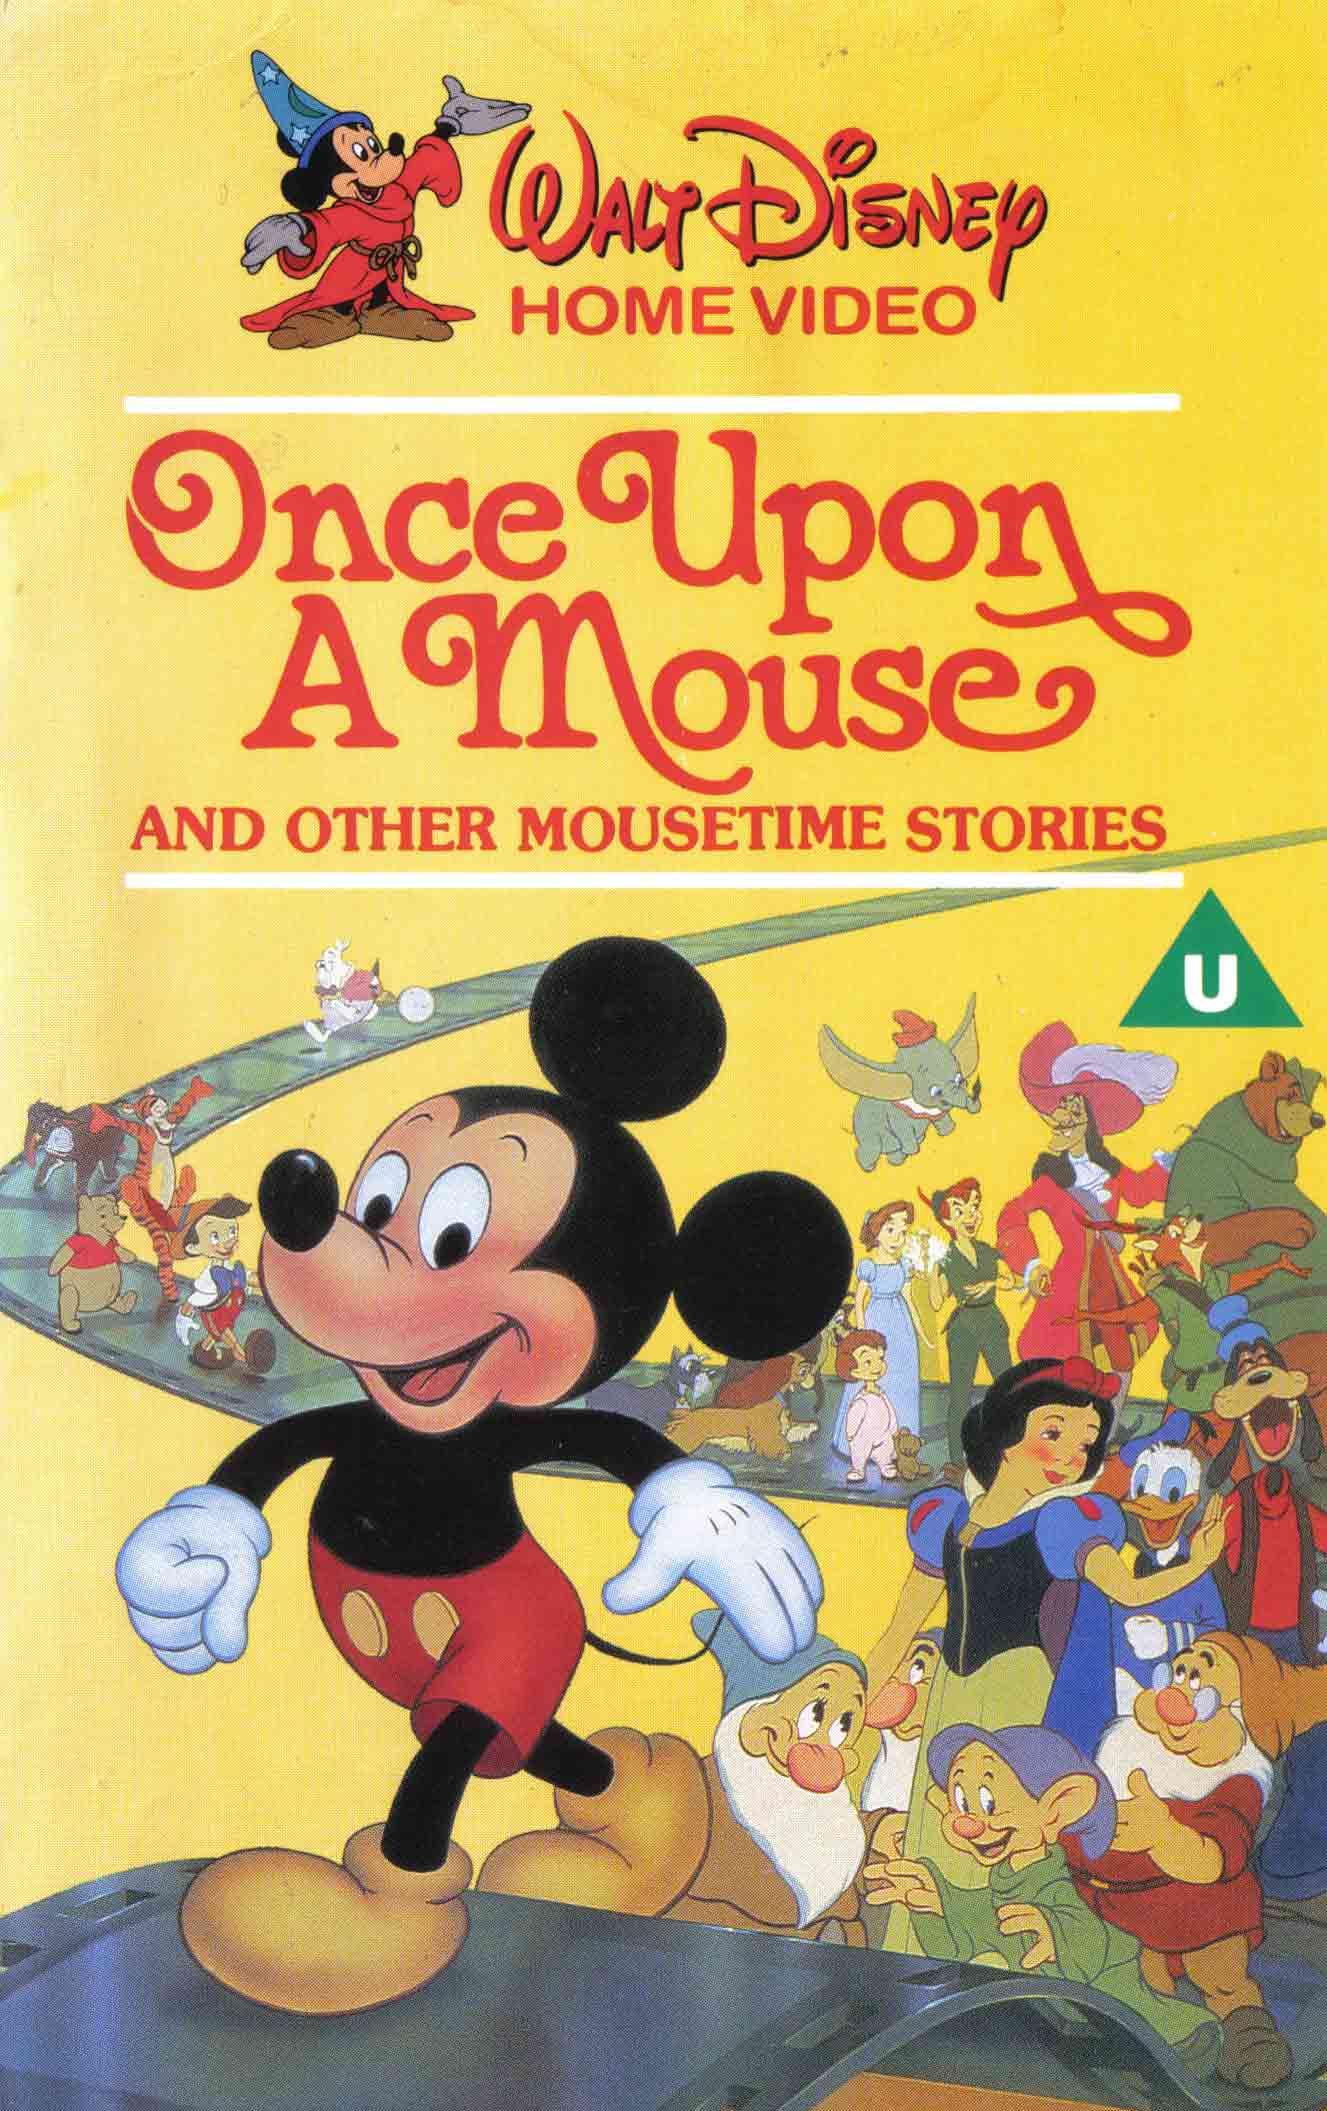 1a2877fde6b Once Upon a Mouse (1981) - IMDb